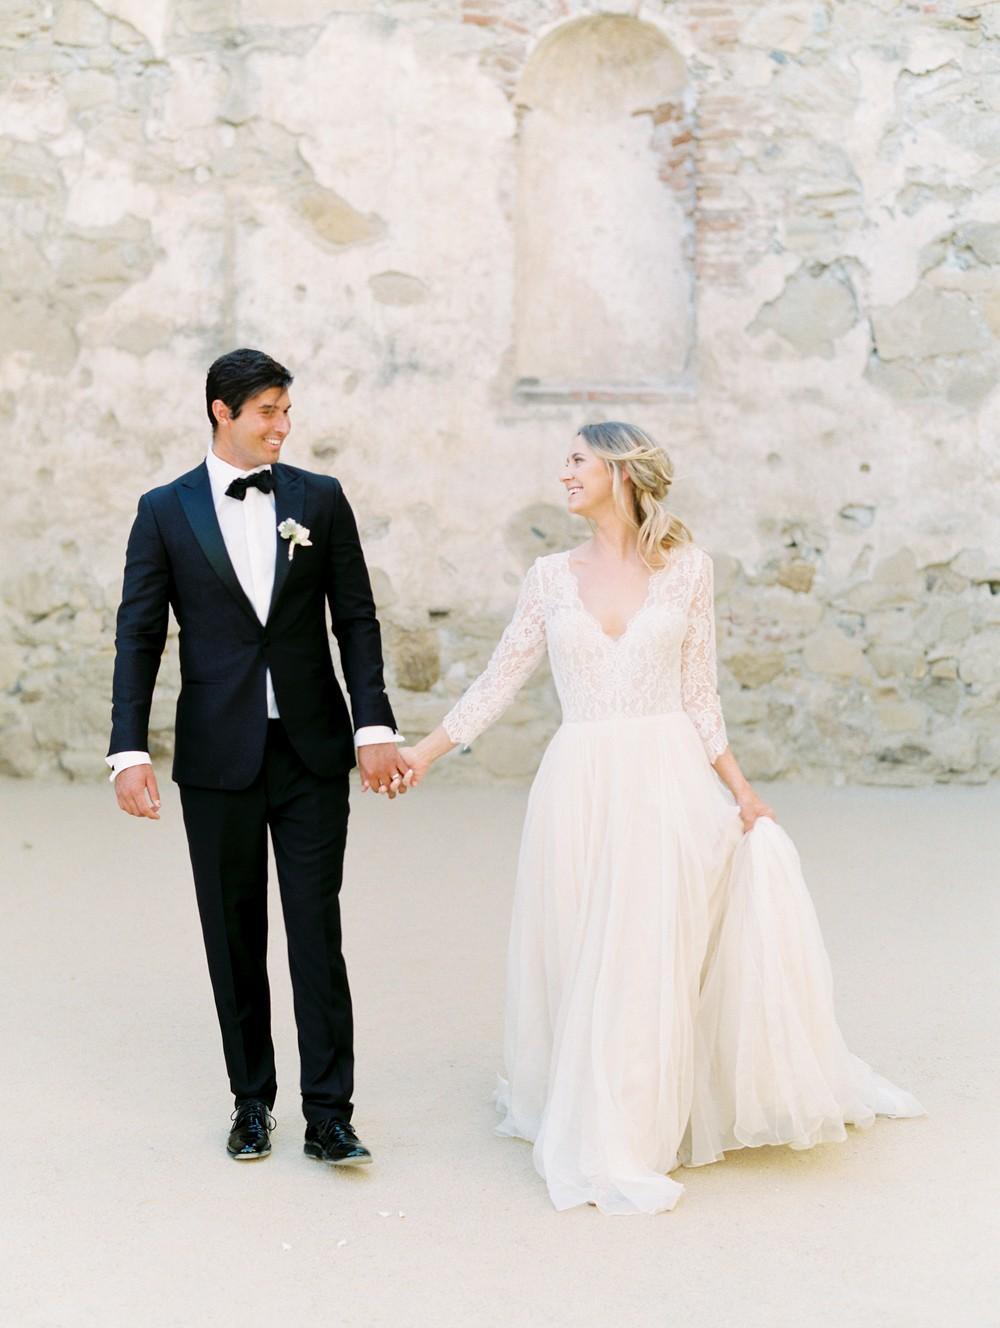 San Juan Mission Wedding Inspiration with neutral tones